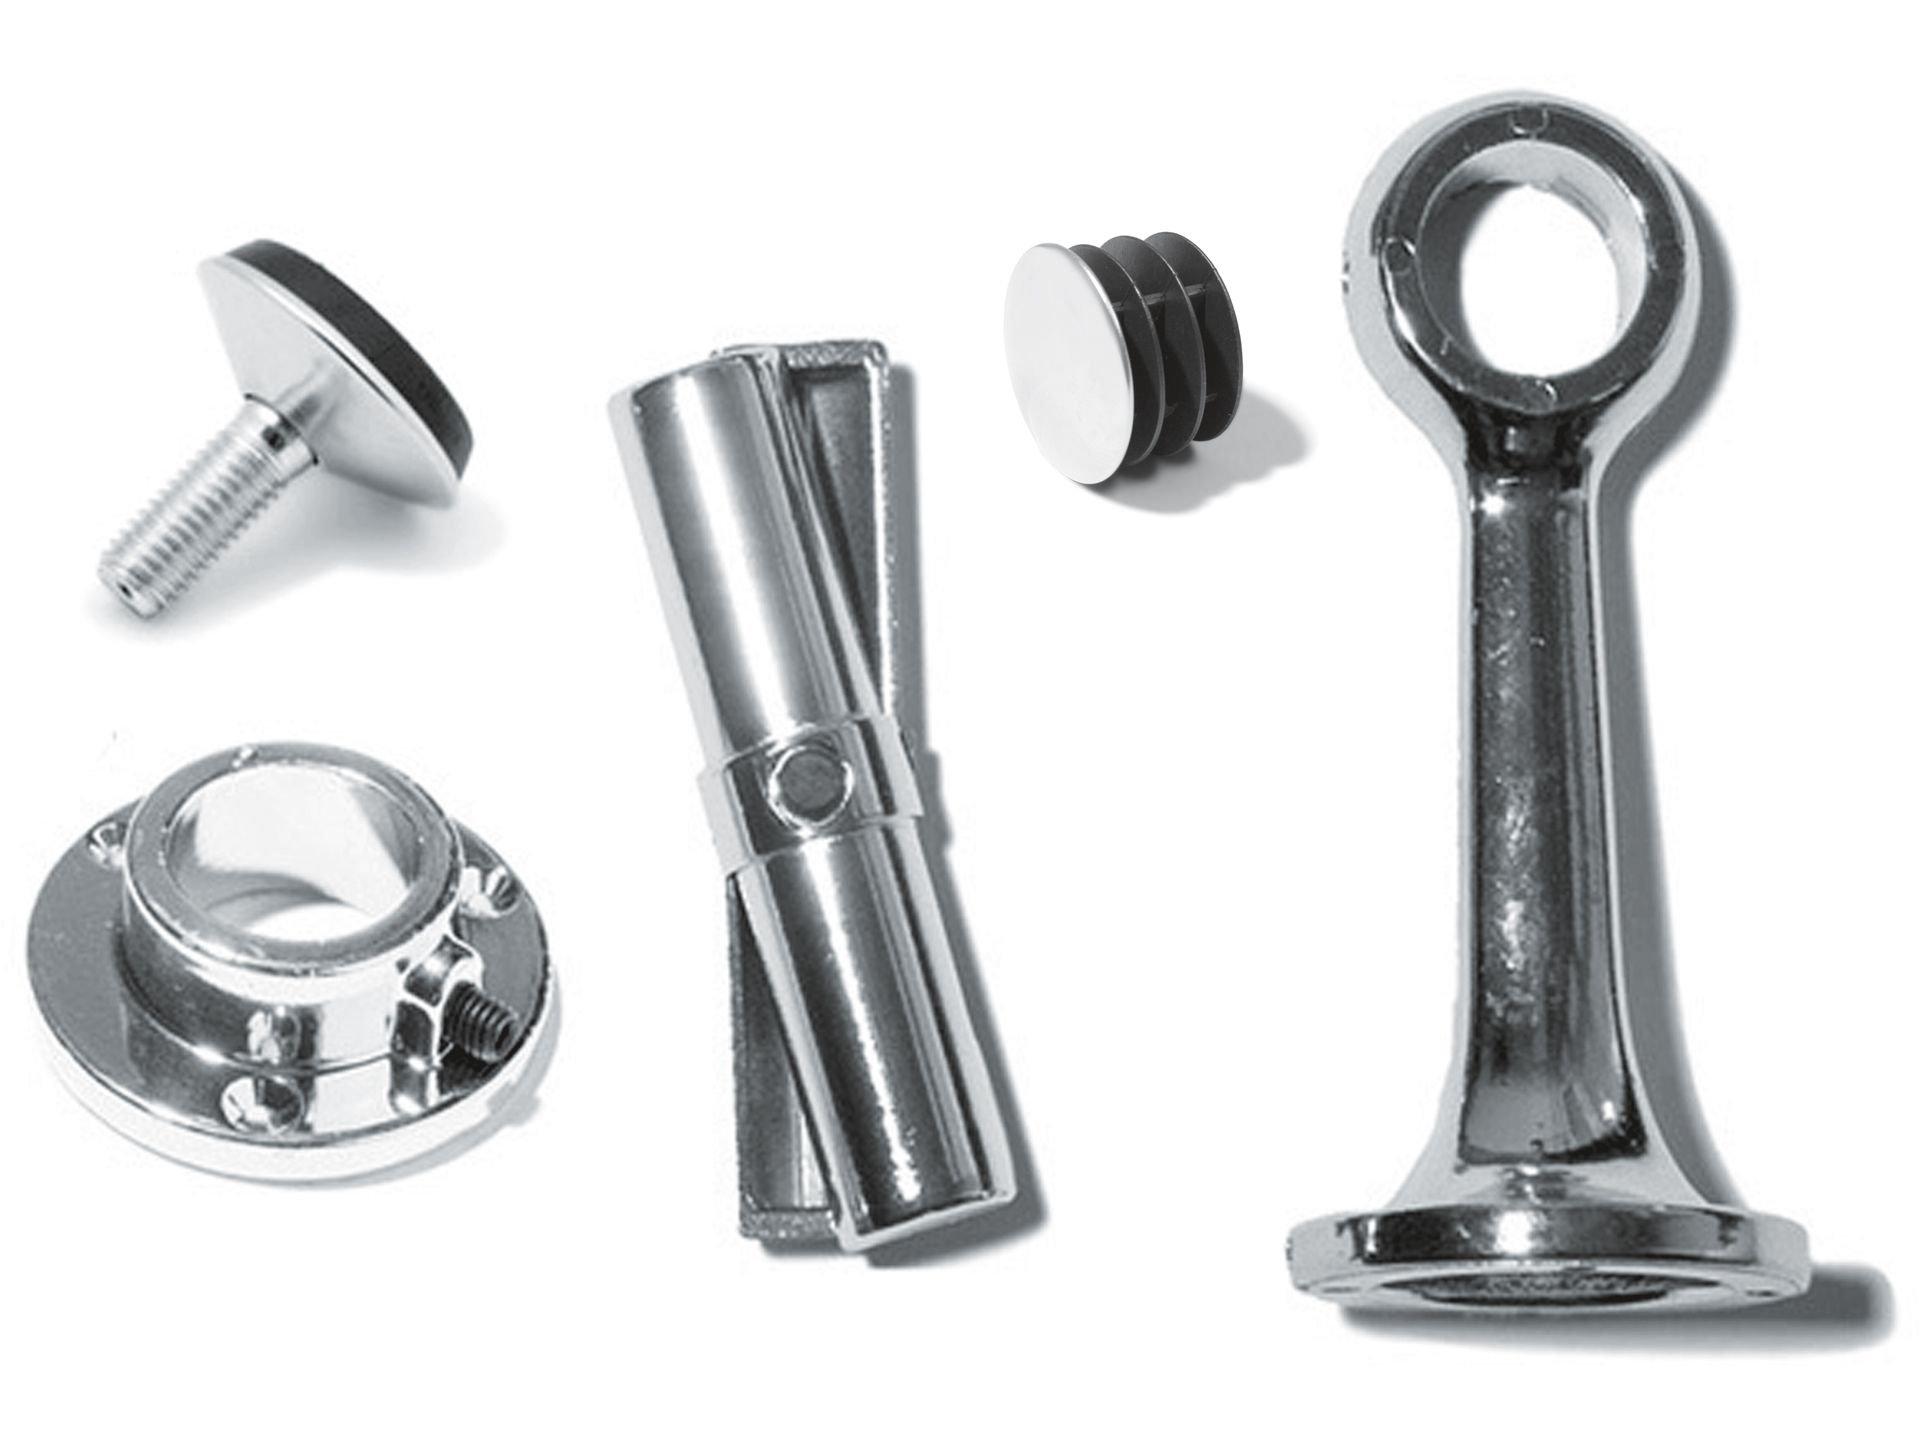 Relativ Stahl Rundrohr ø 25 mm, verchromt kaufen | Modulor TC09